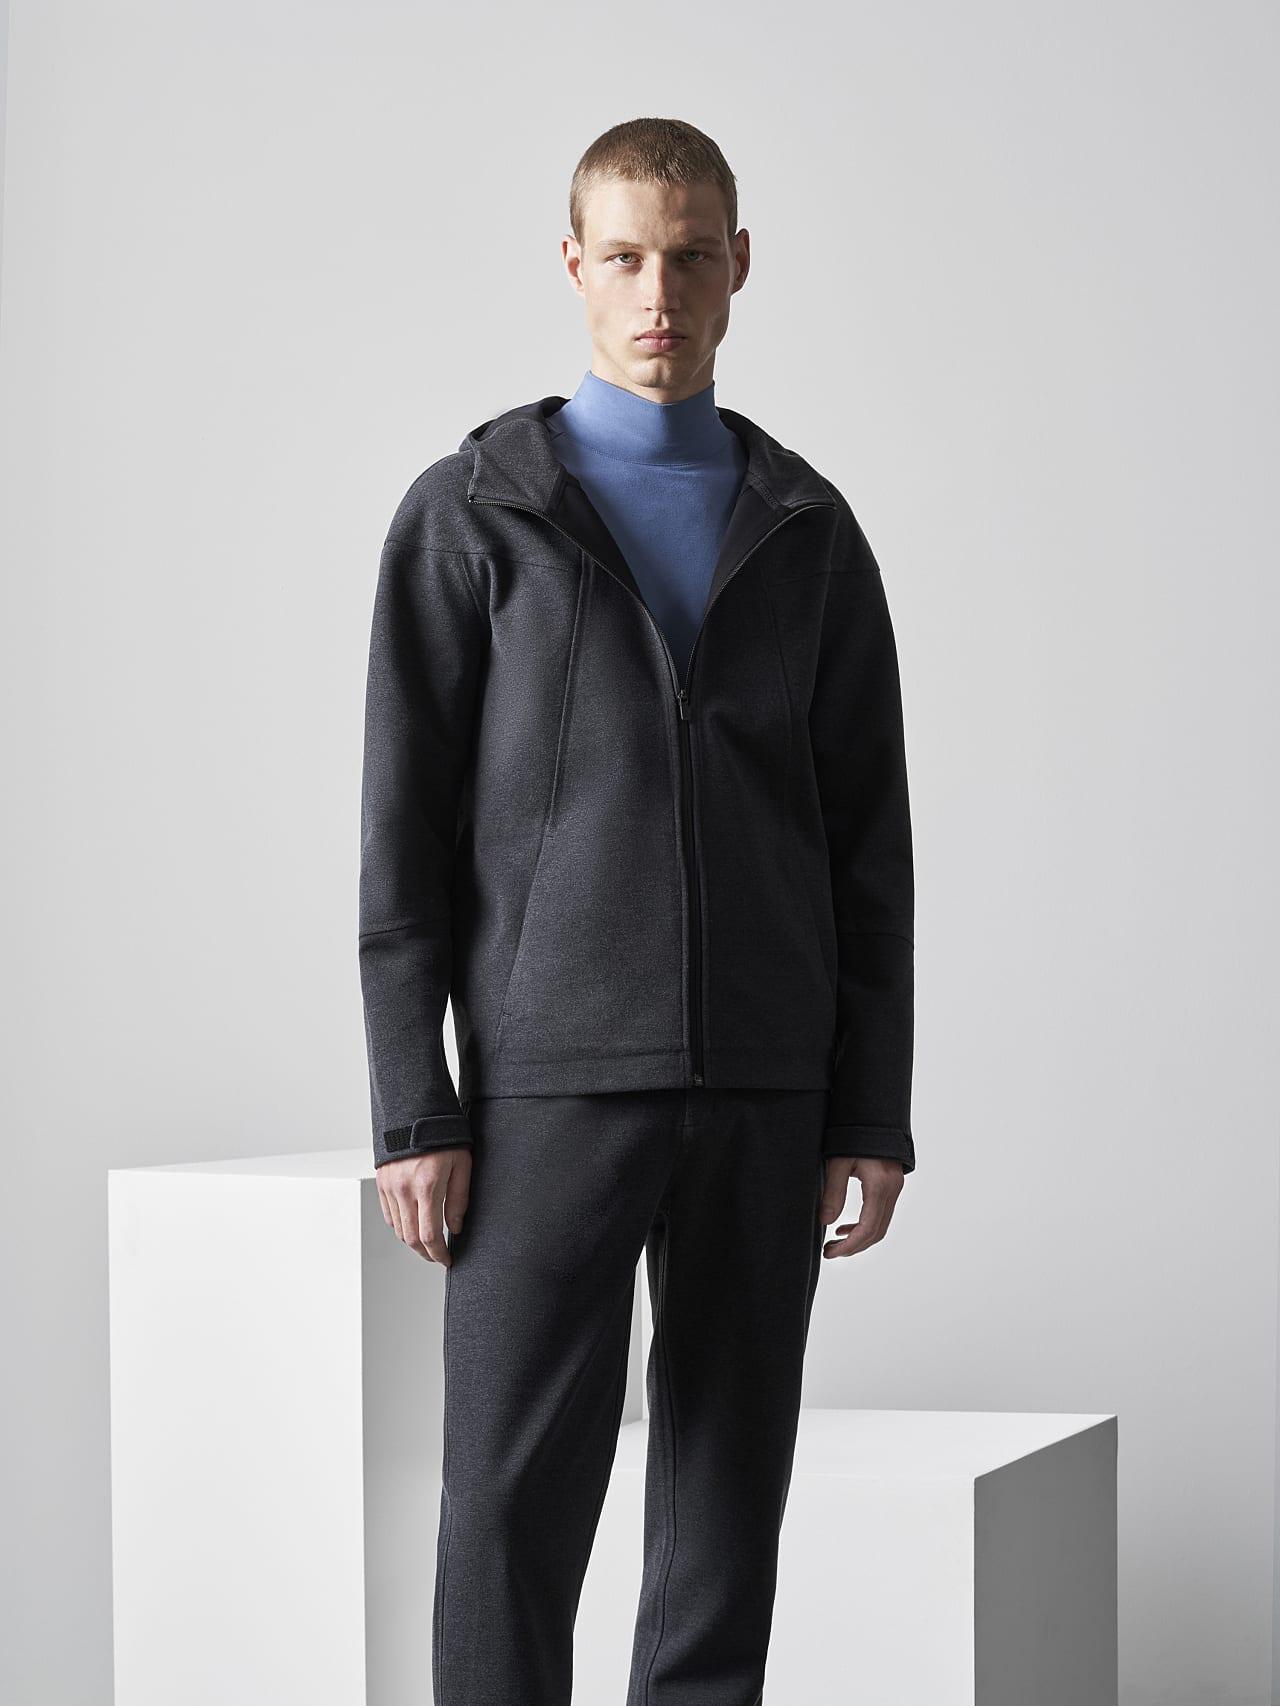 SROTE V1.Y5.02 Waterproof Sweatjacket dark grey / anthracite Front Alpha Tauri